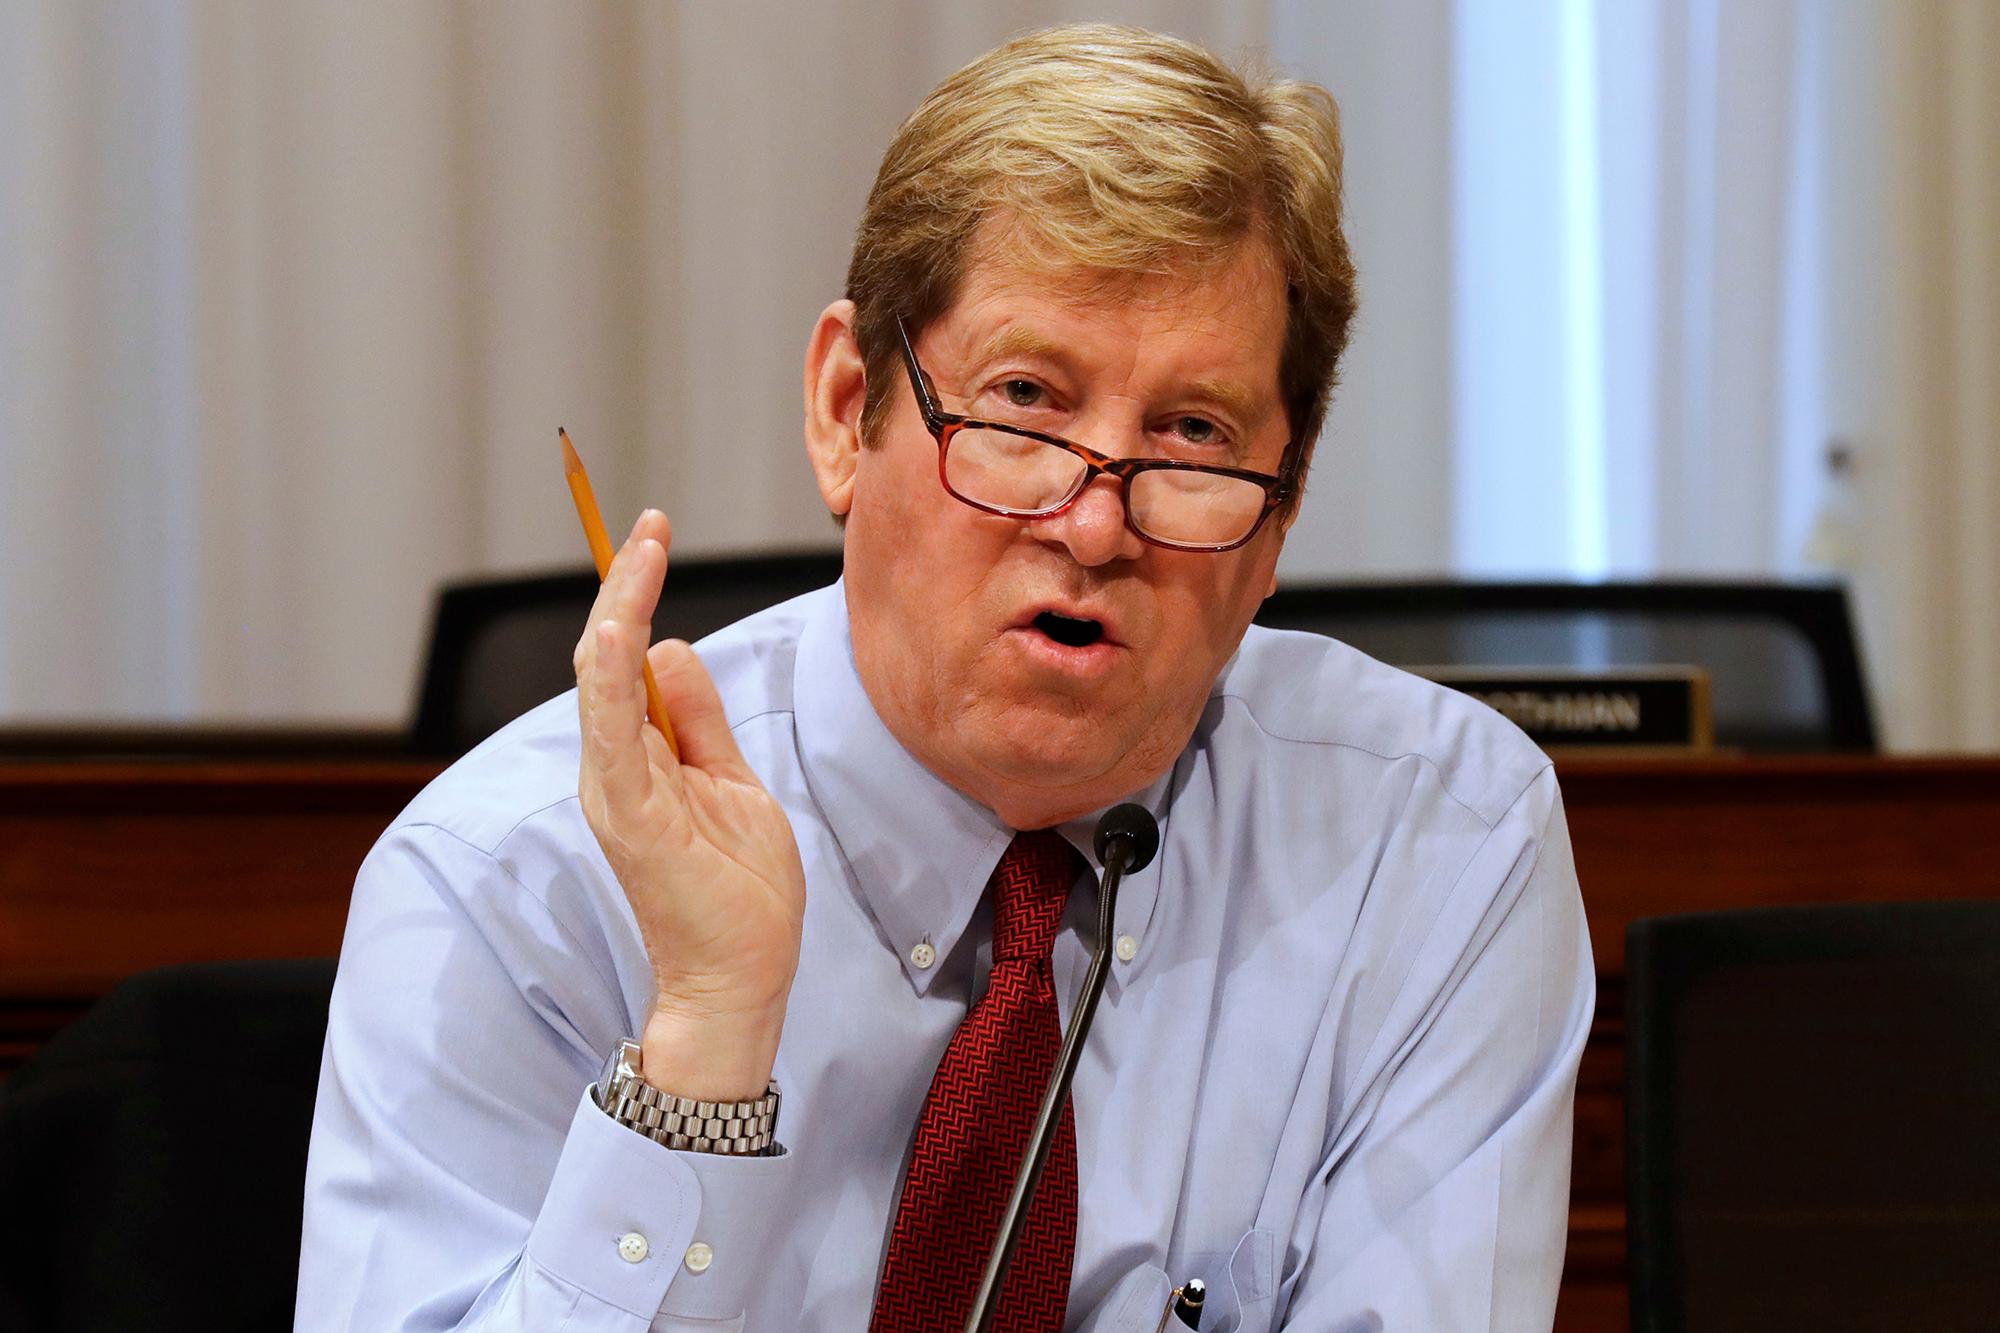 Audio Surfaces of Republican Rep. Jason Lewis Mocking Sexual Harassment Victim